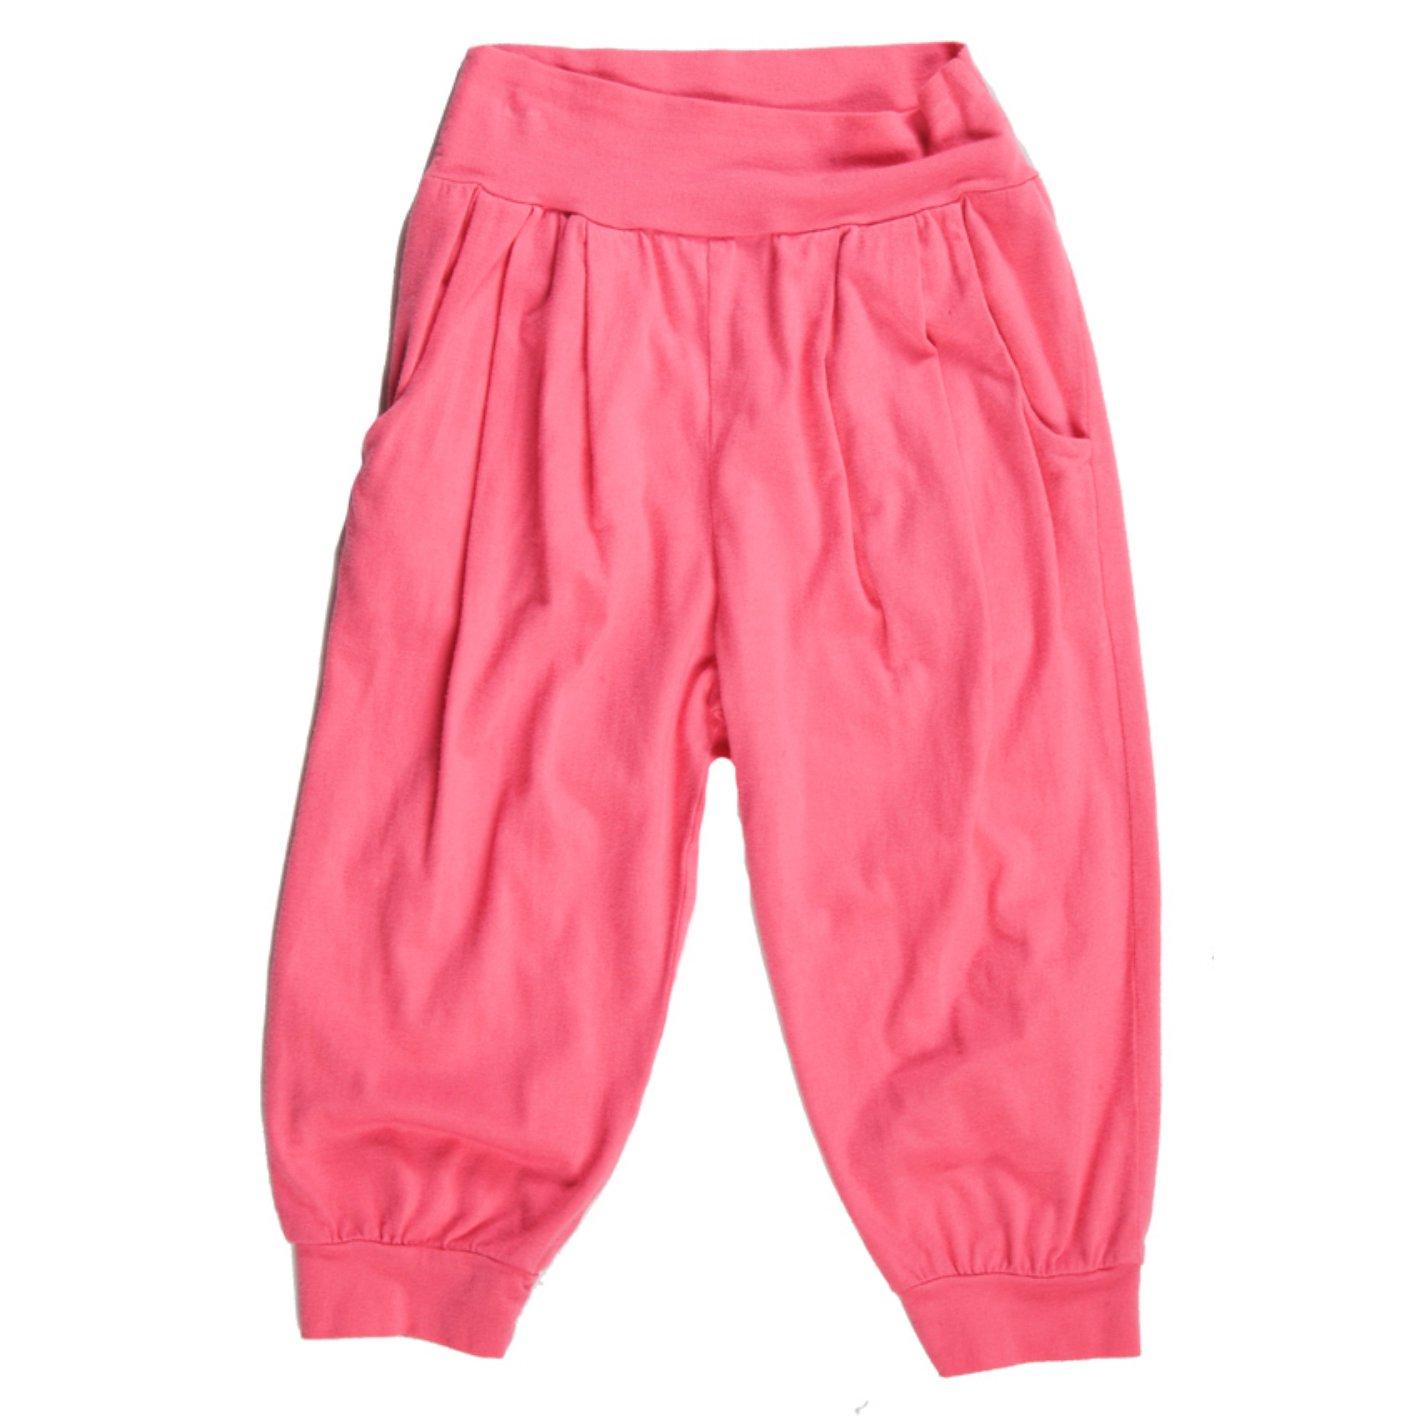 Joah Love Big Girls' Shay Pant in Taffy, 12